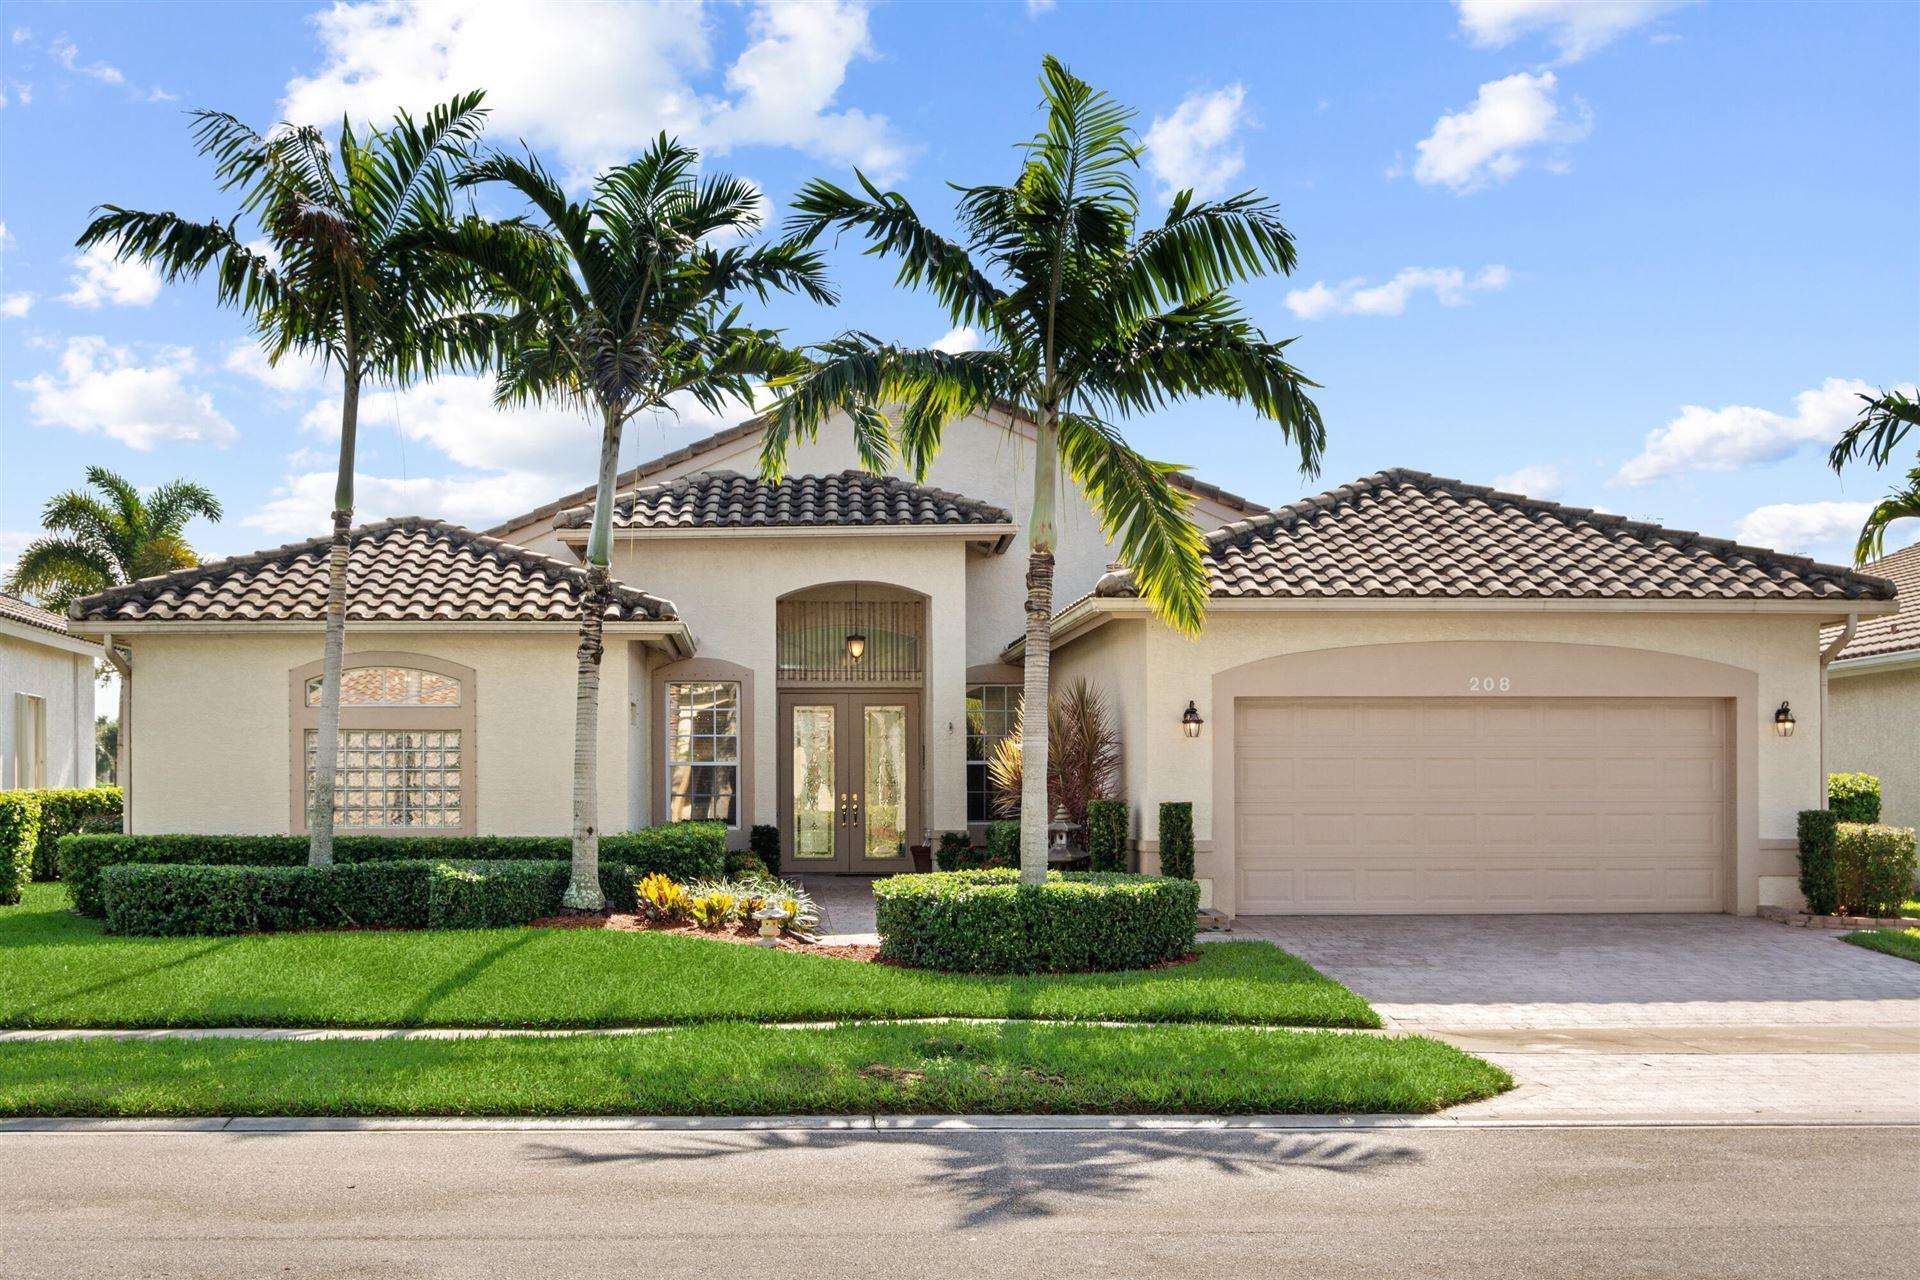 208 NW Liseron Way, Port Saint Lucie, FL 34986 - MLS#: RX-10745703